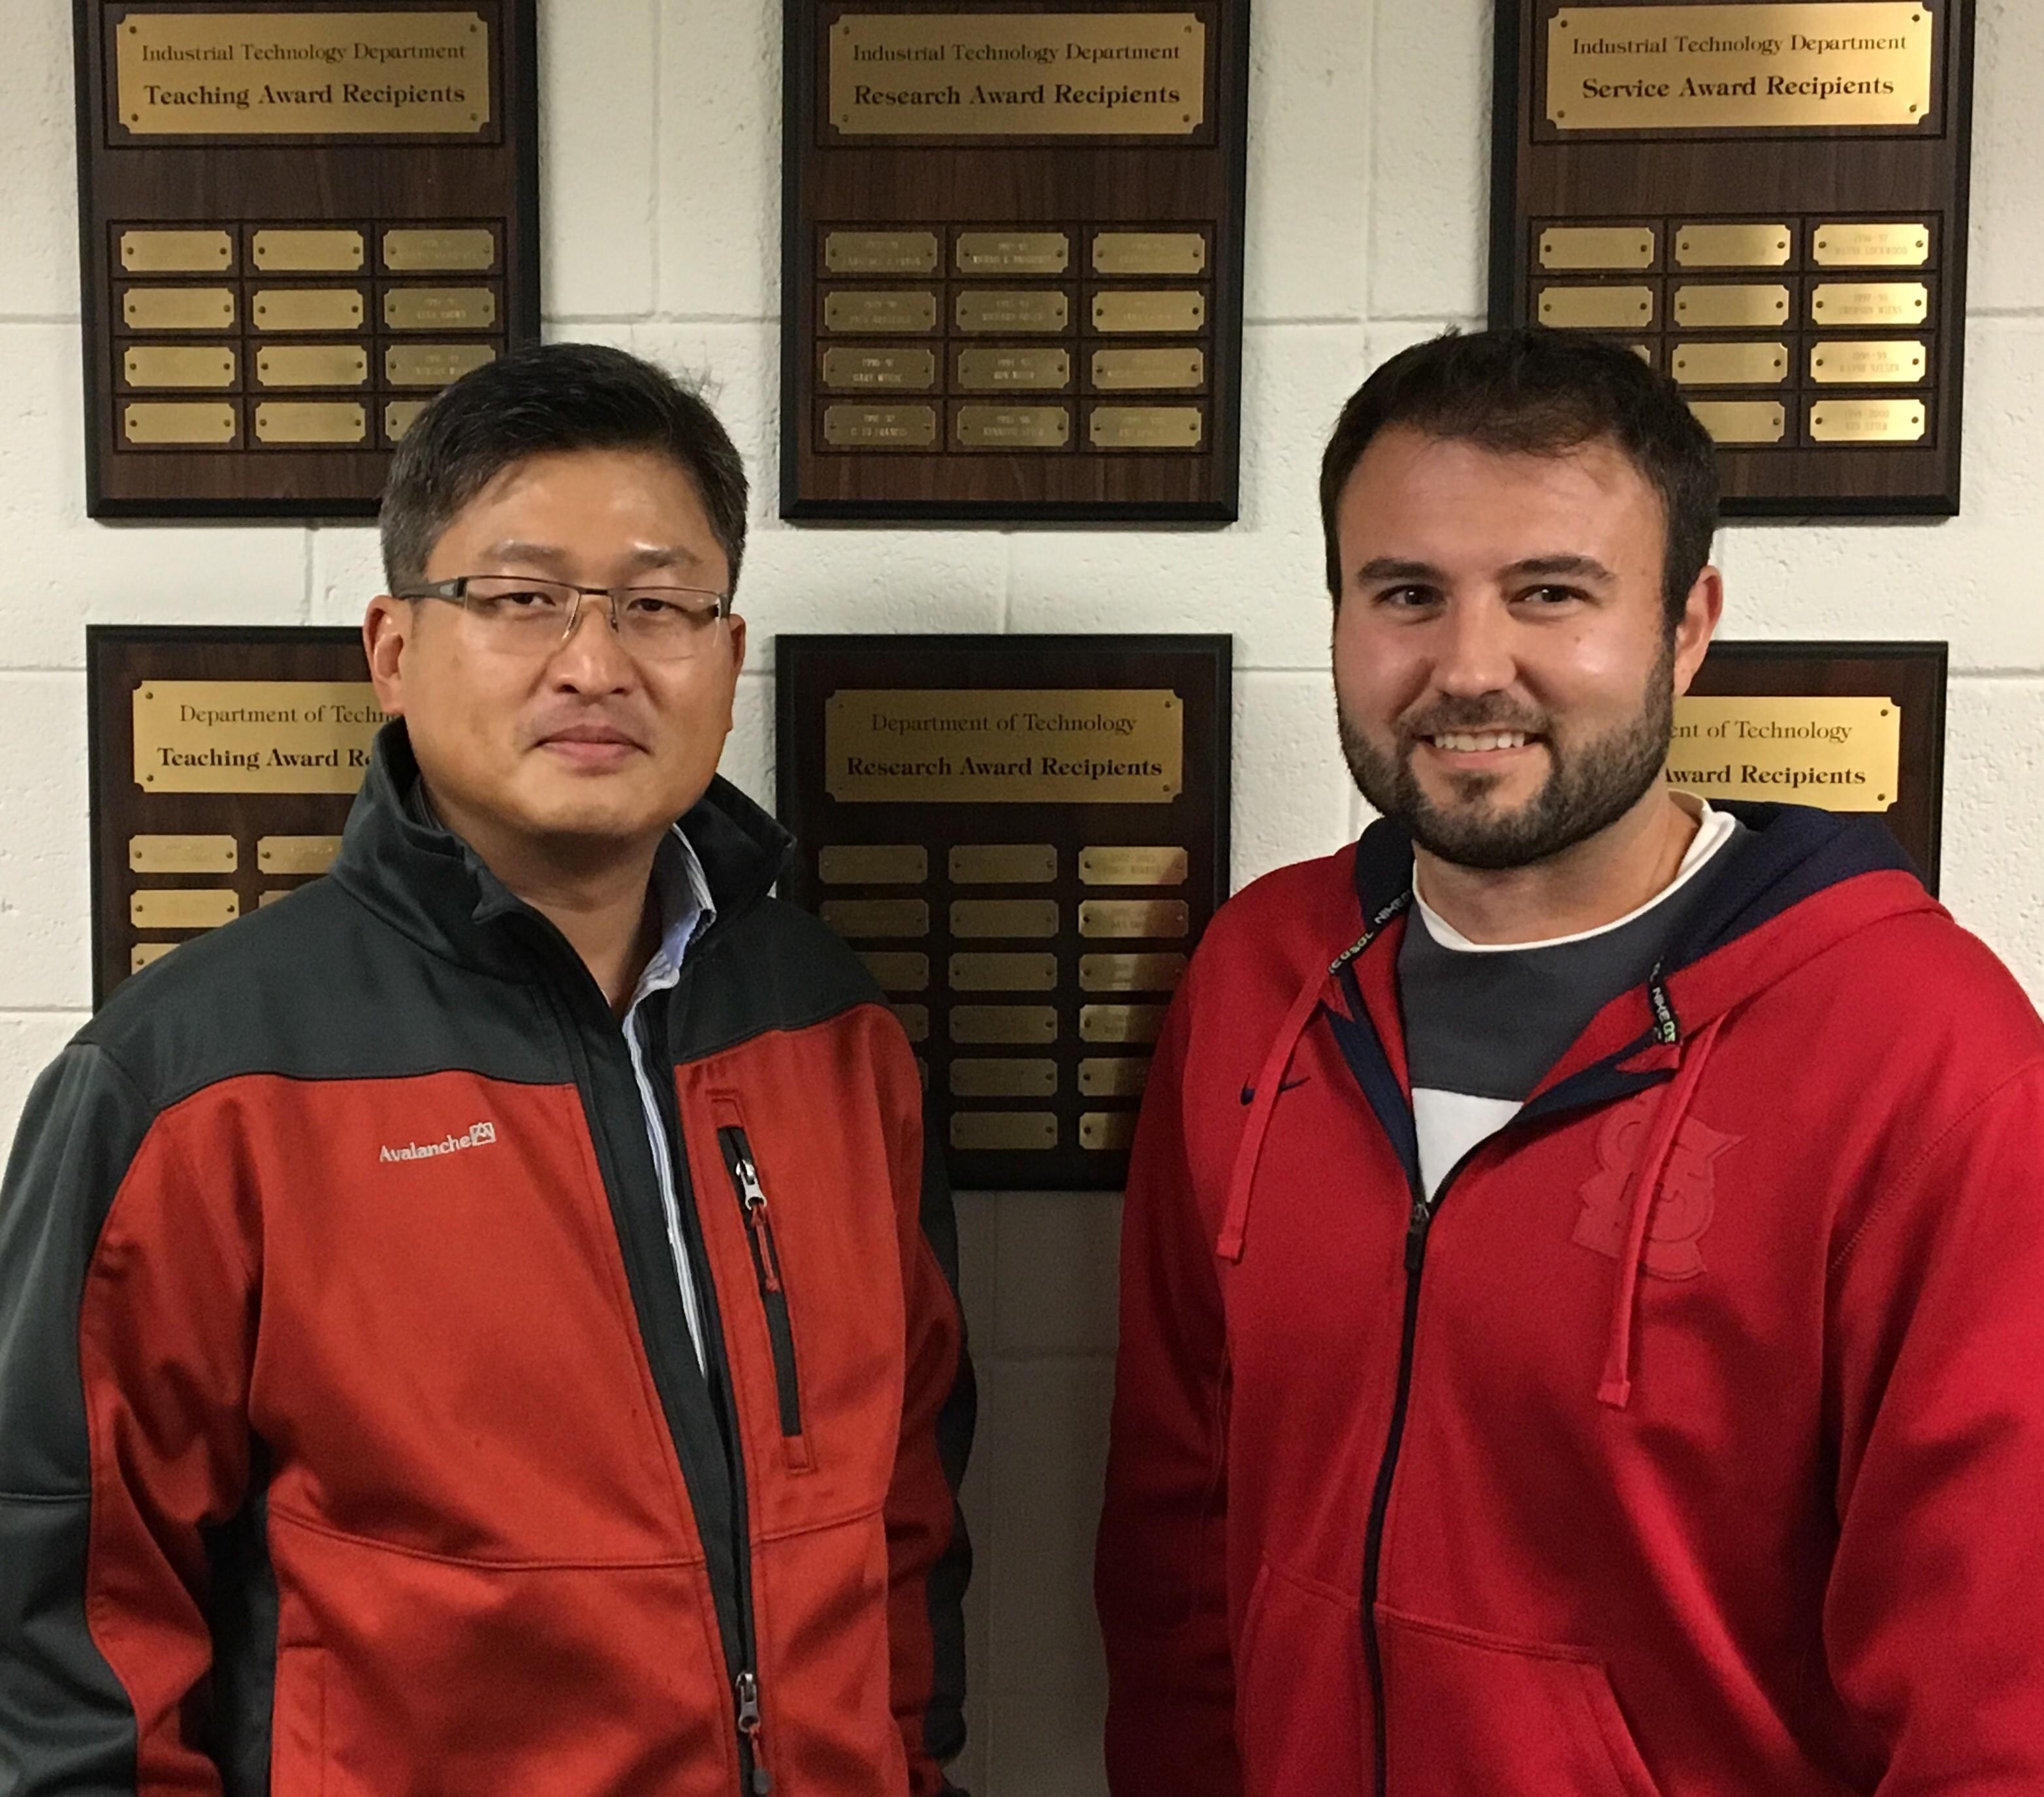 Professor Bo Park and Logan Frederick